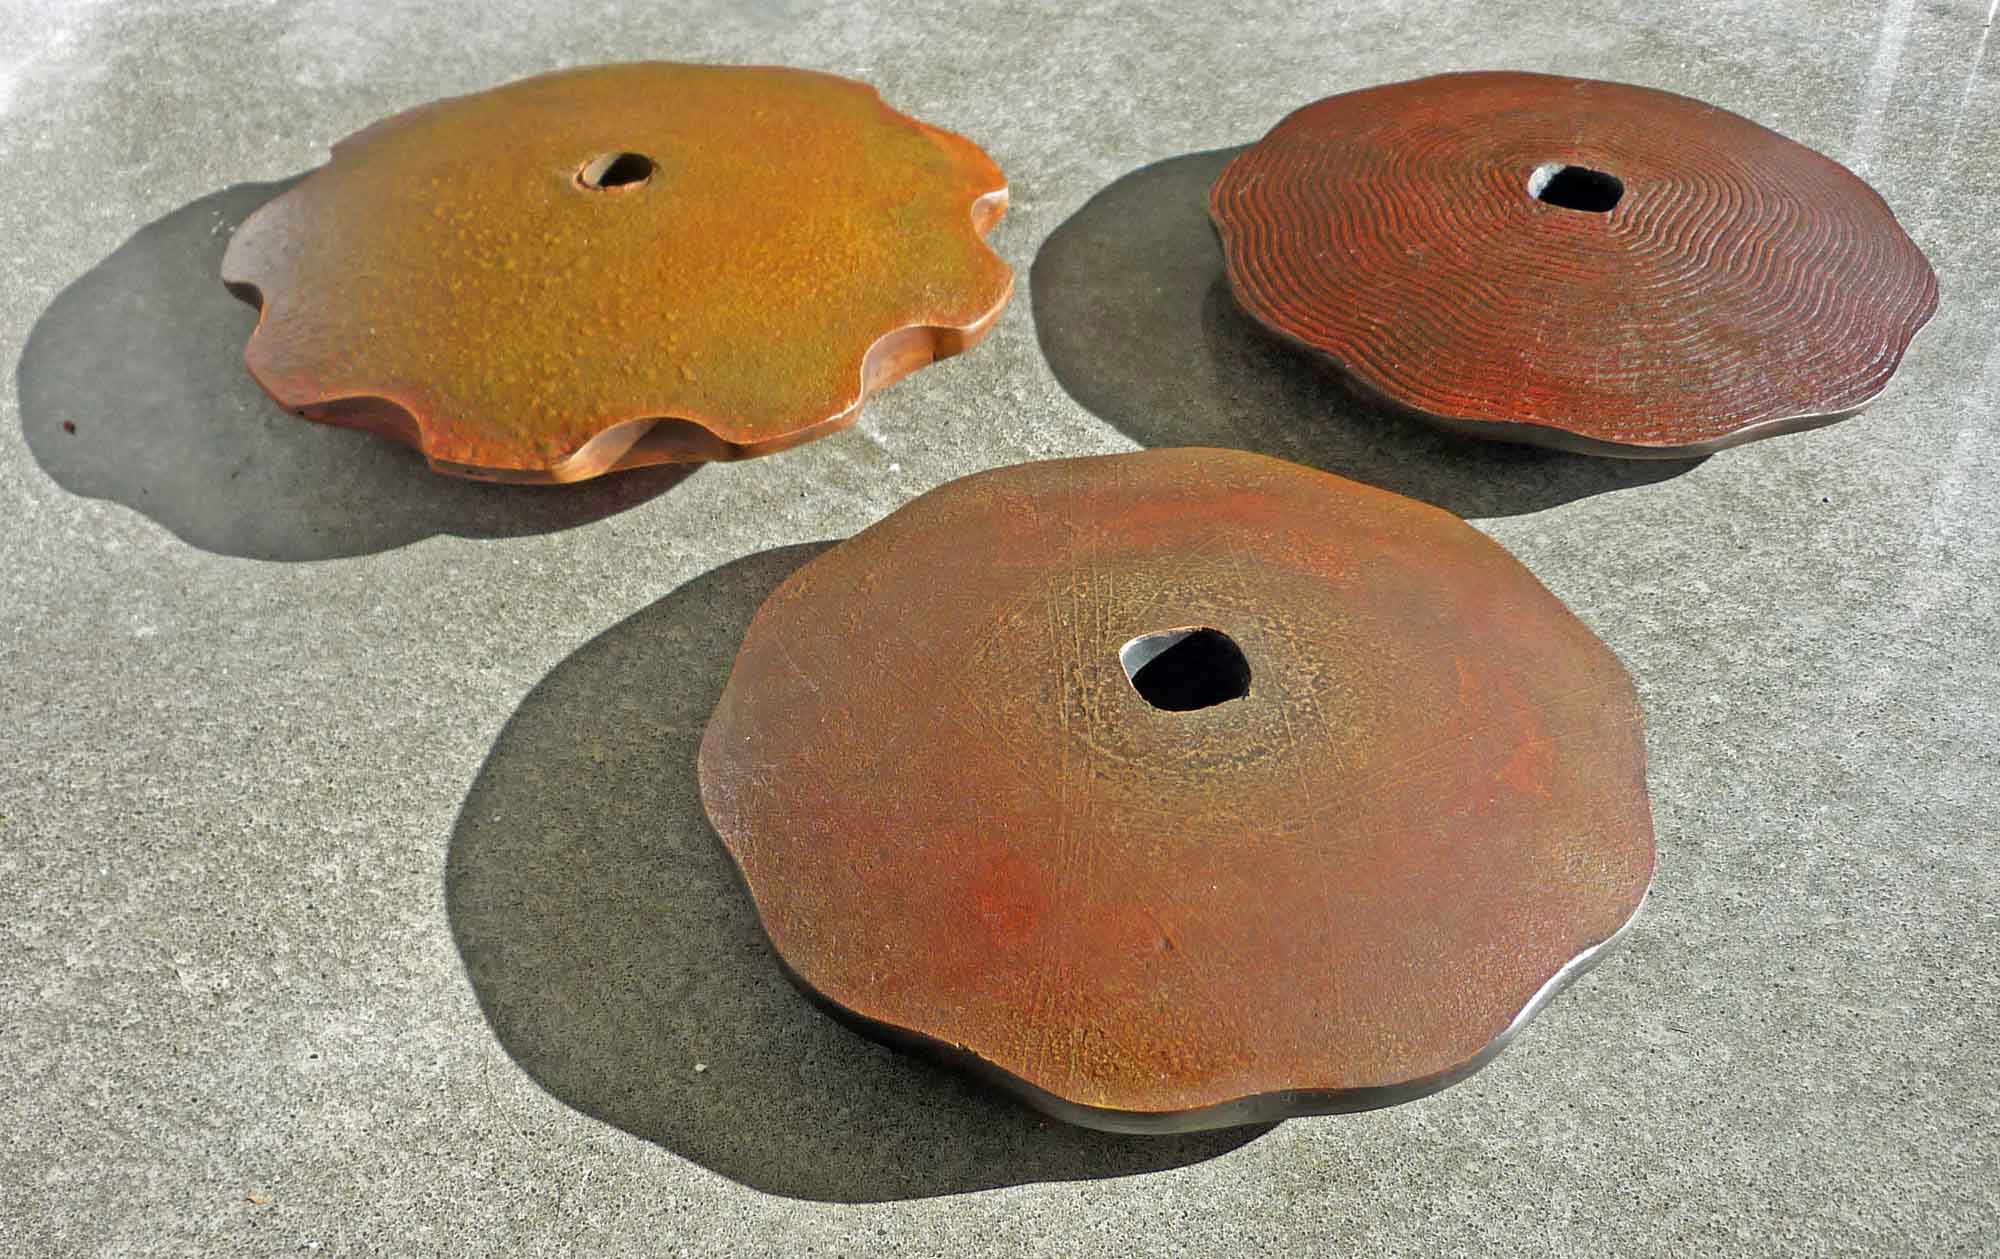 hearthstones-kathy-boyle-plaster-prints